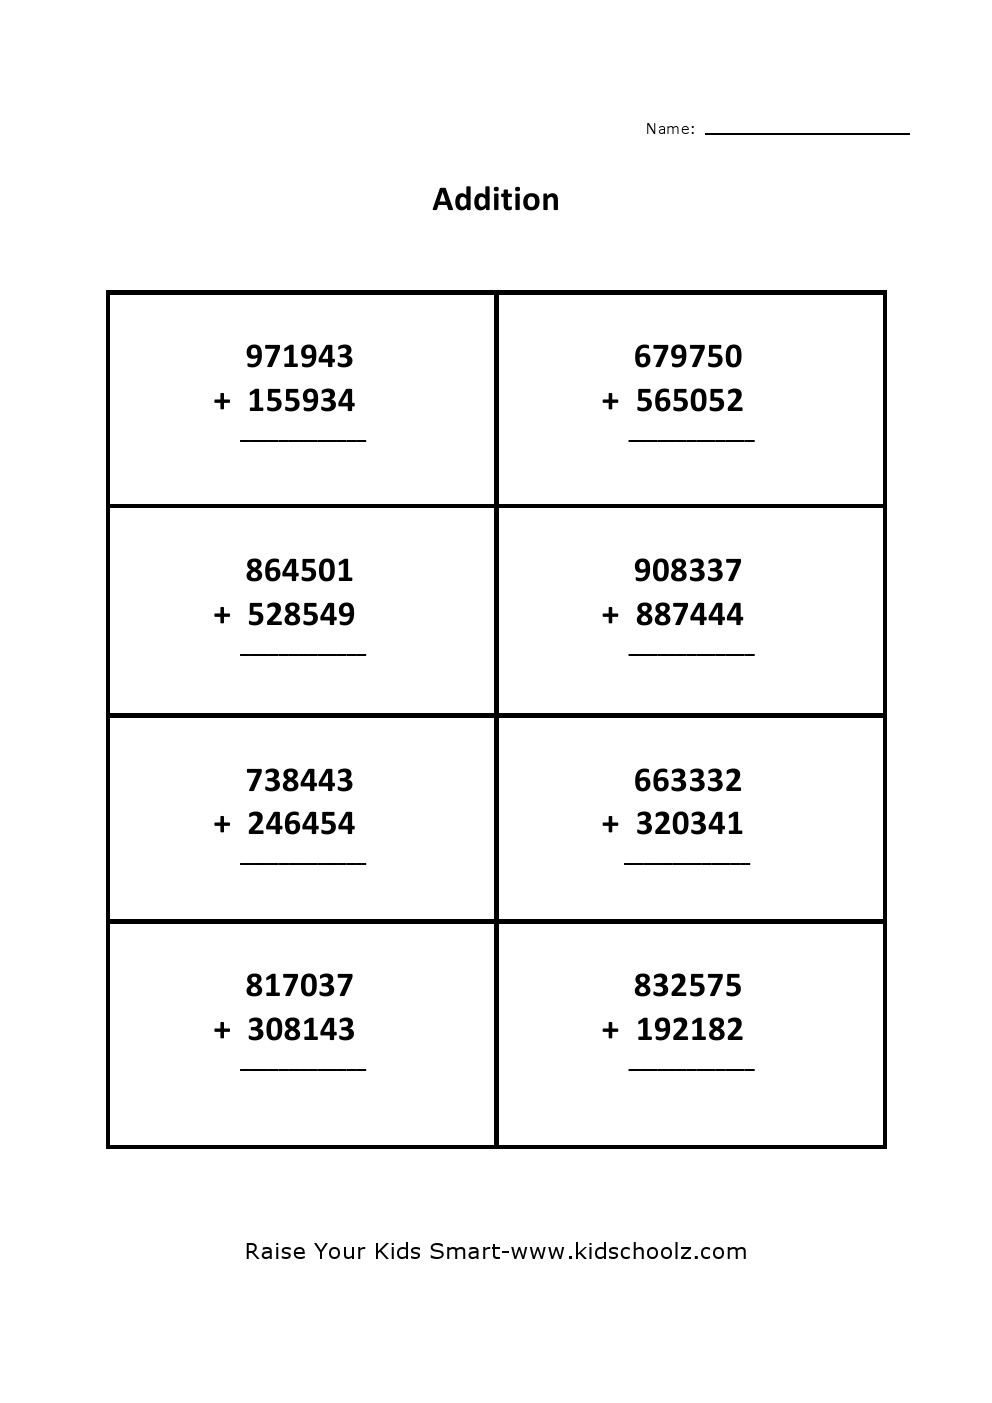 hight resolution of Grade 5 - Addition Worksheet 4 - Kidschoolz